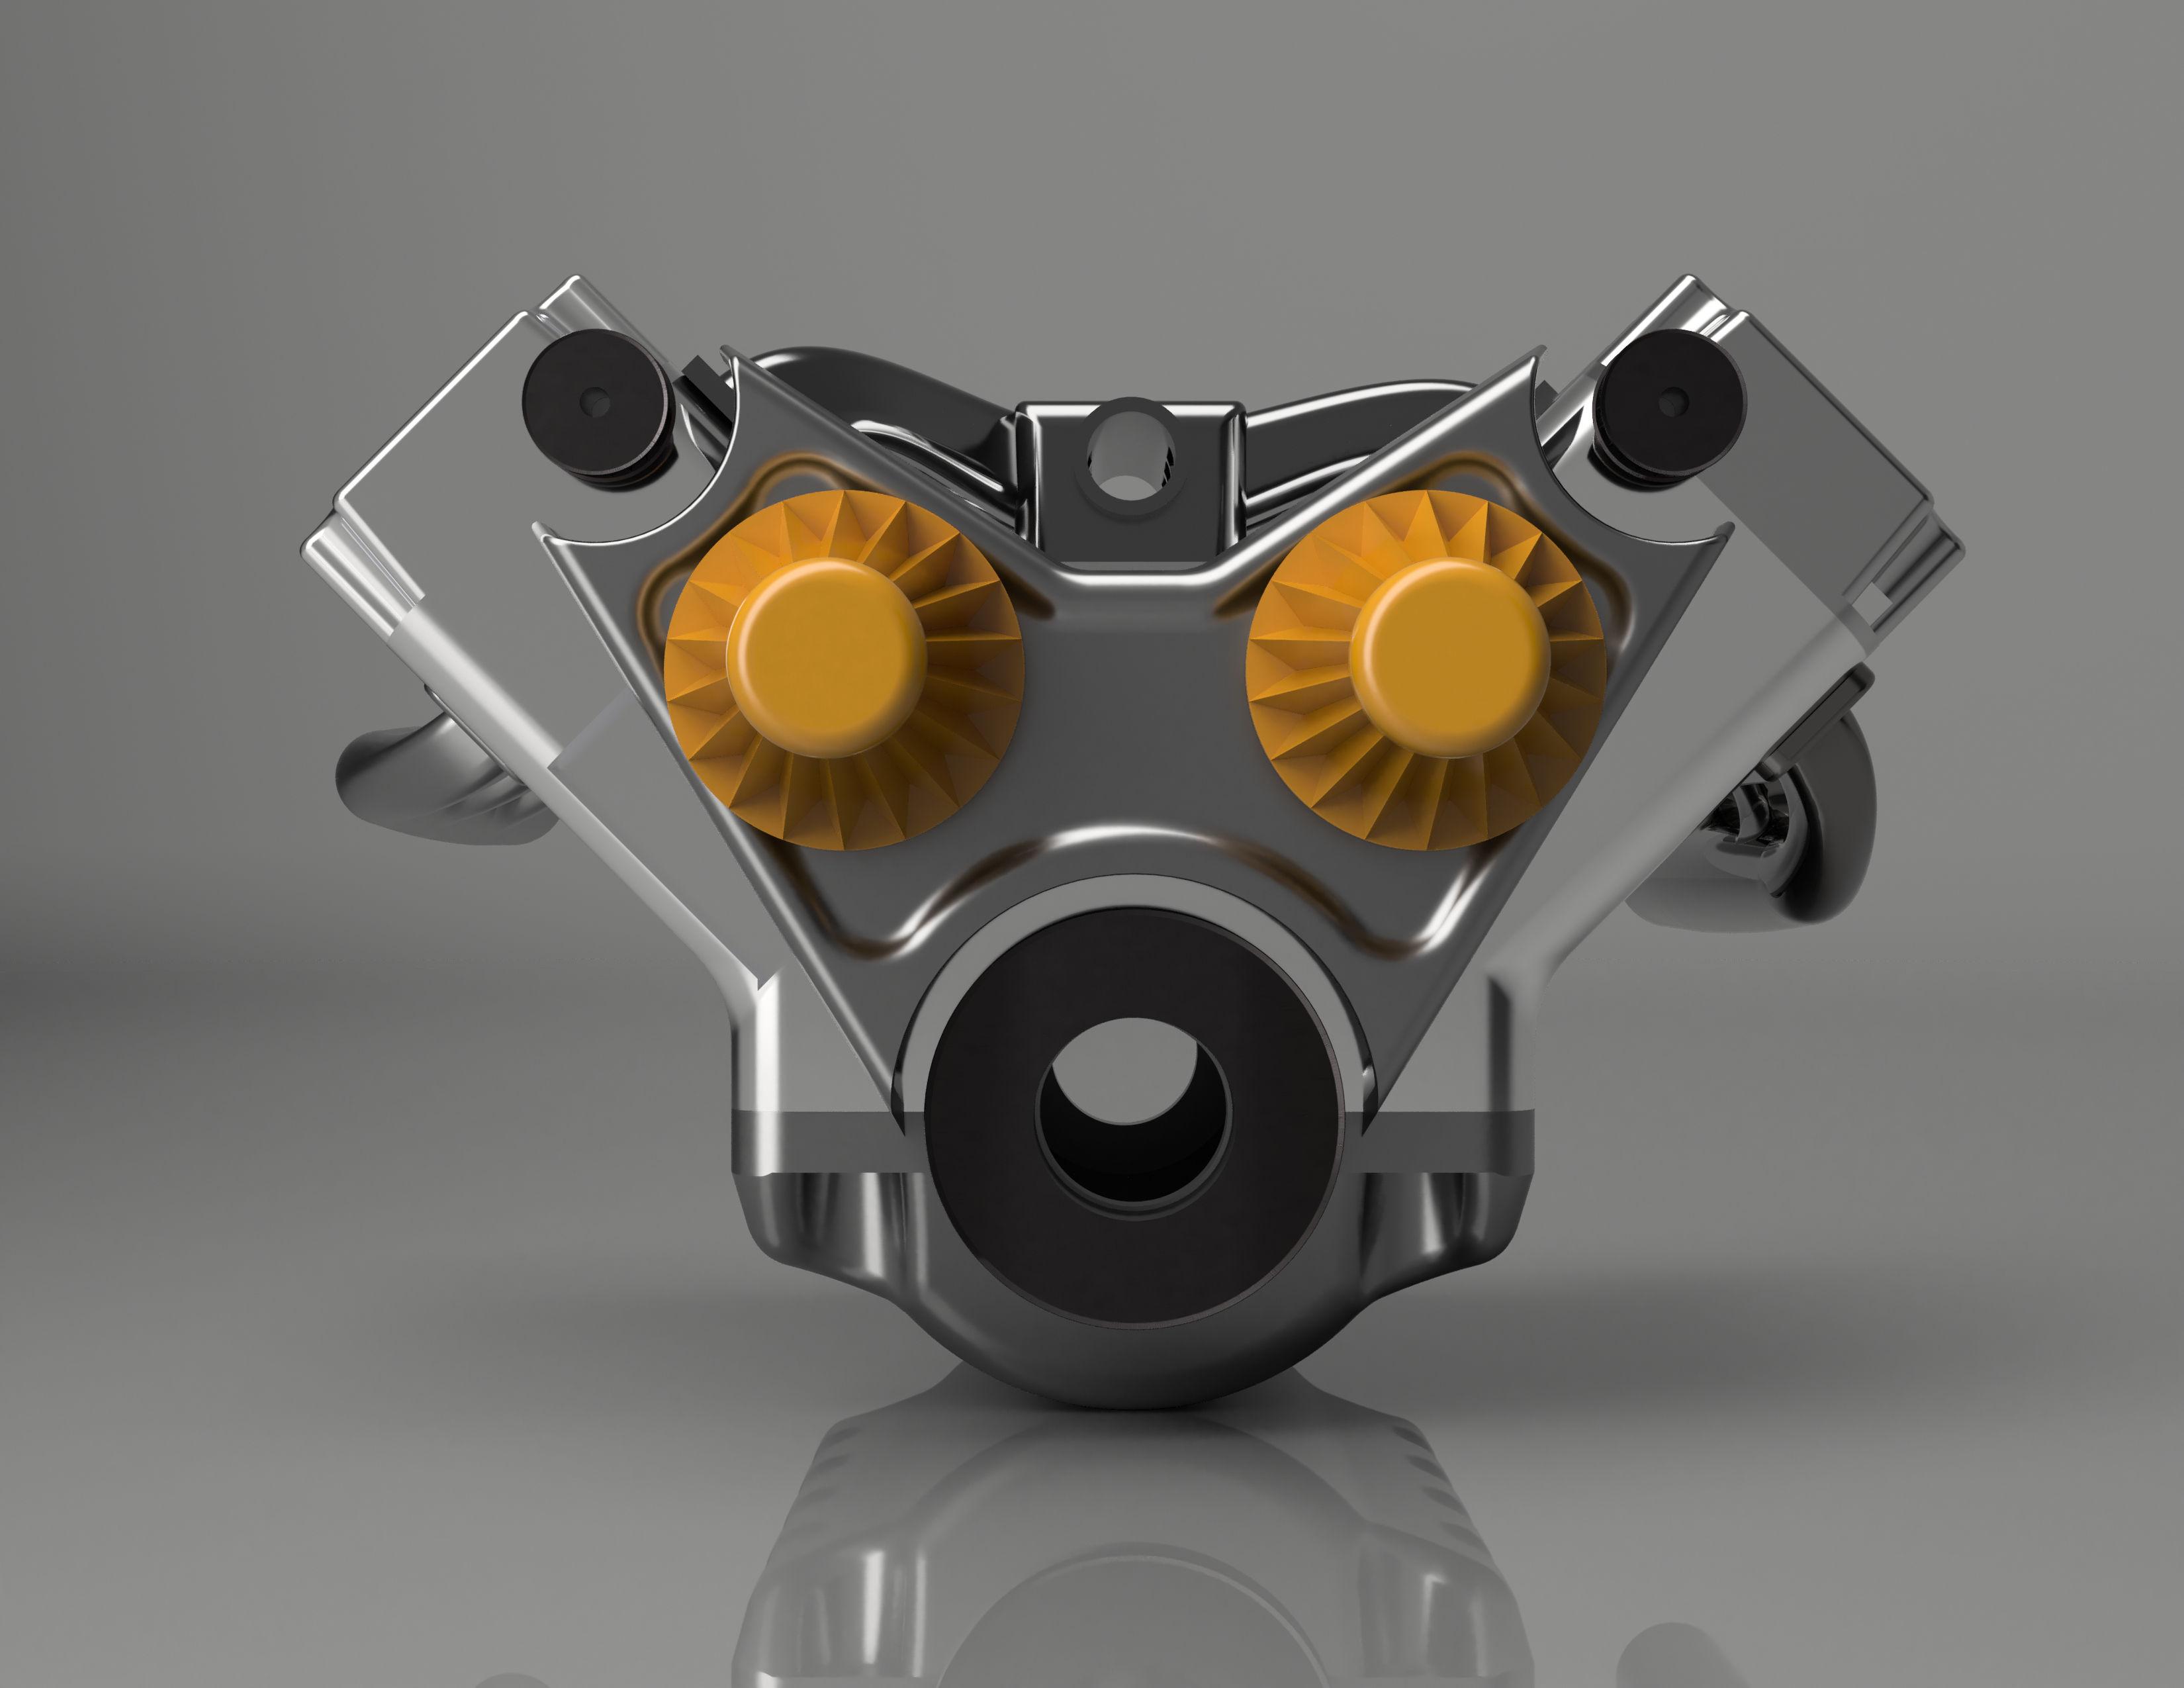 Engine-2017-sep-29-02-00-28pm-000-right-jpg-3500-3500